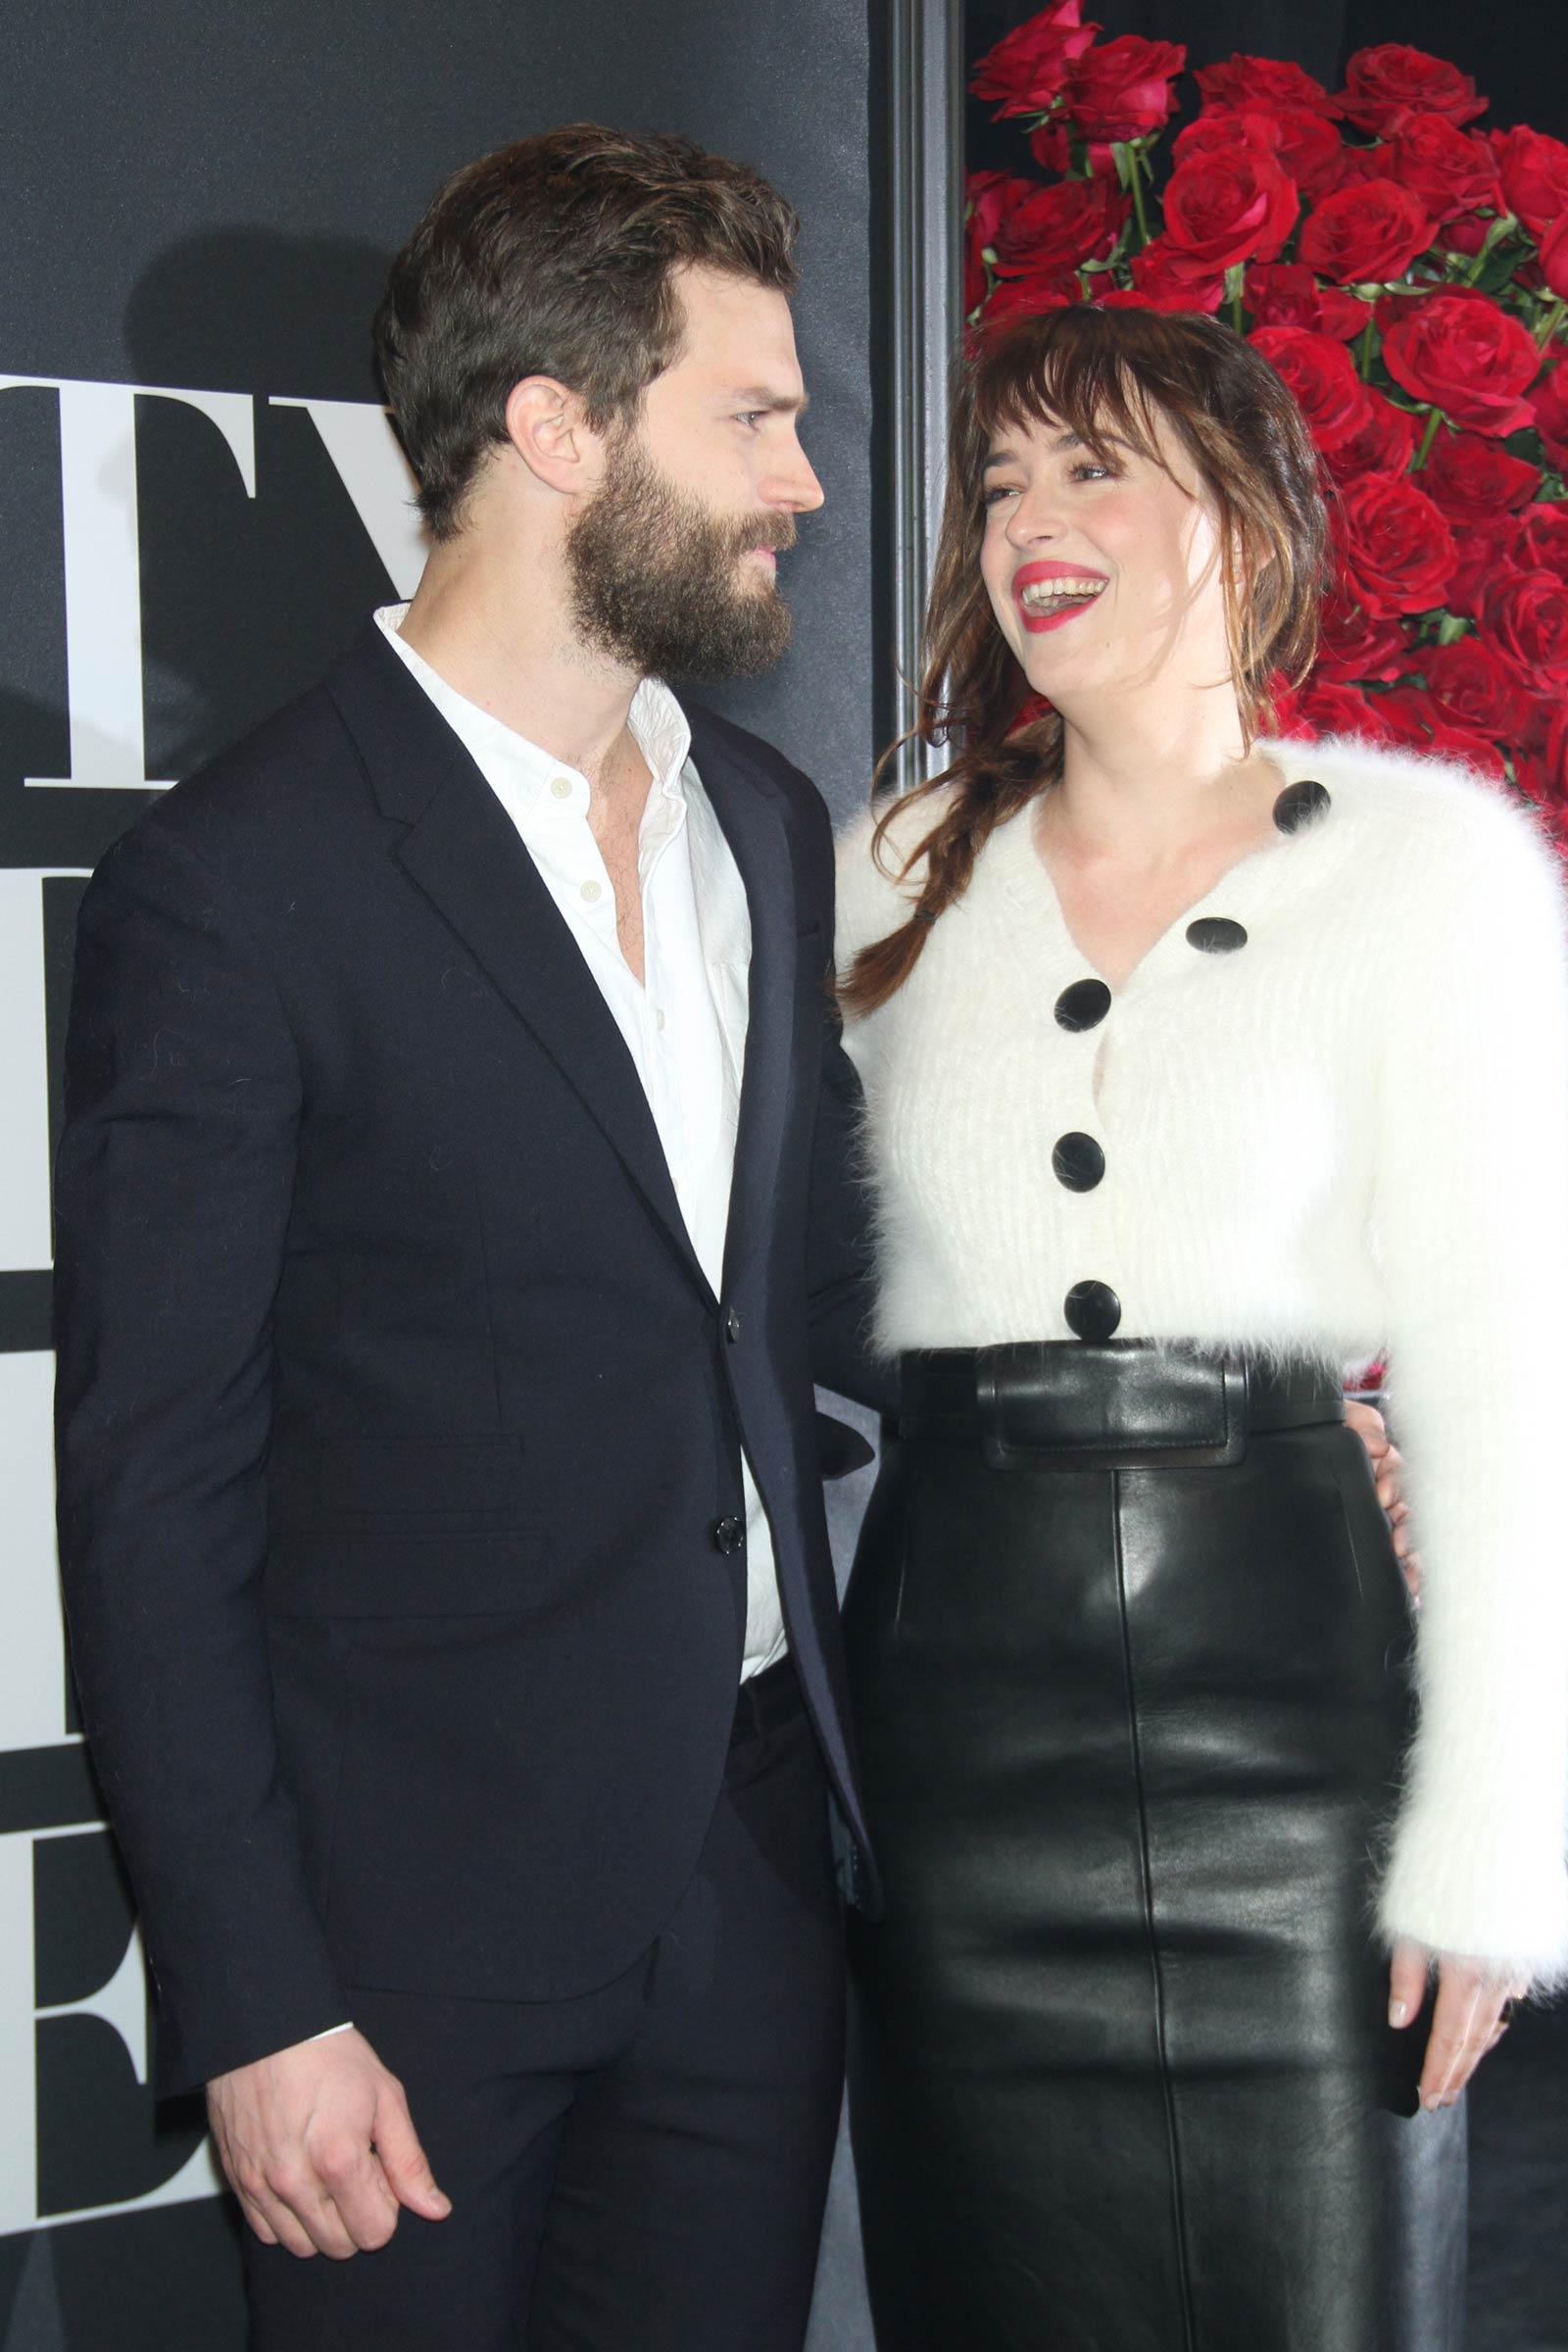 Dakota Johnson attends the Fifty Shades Of Grey screening